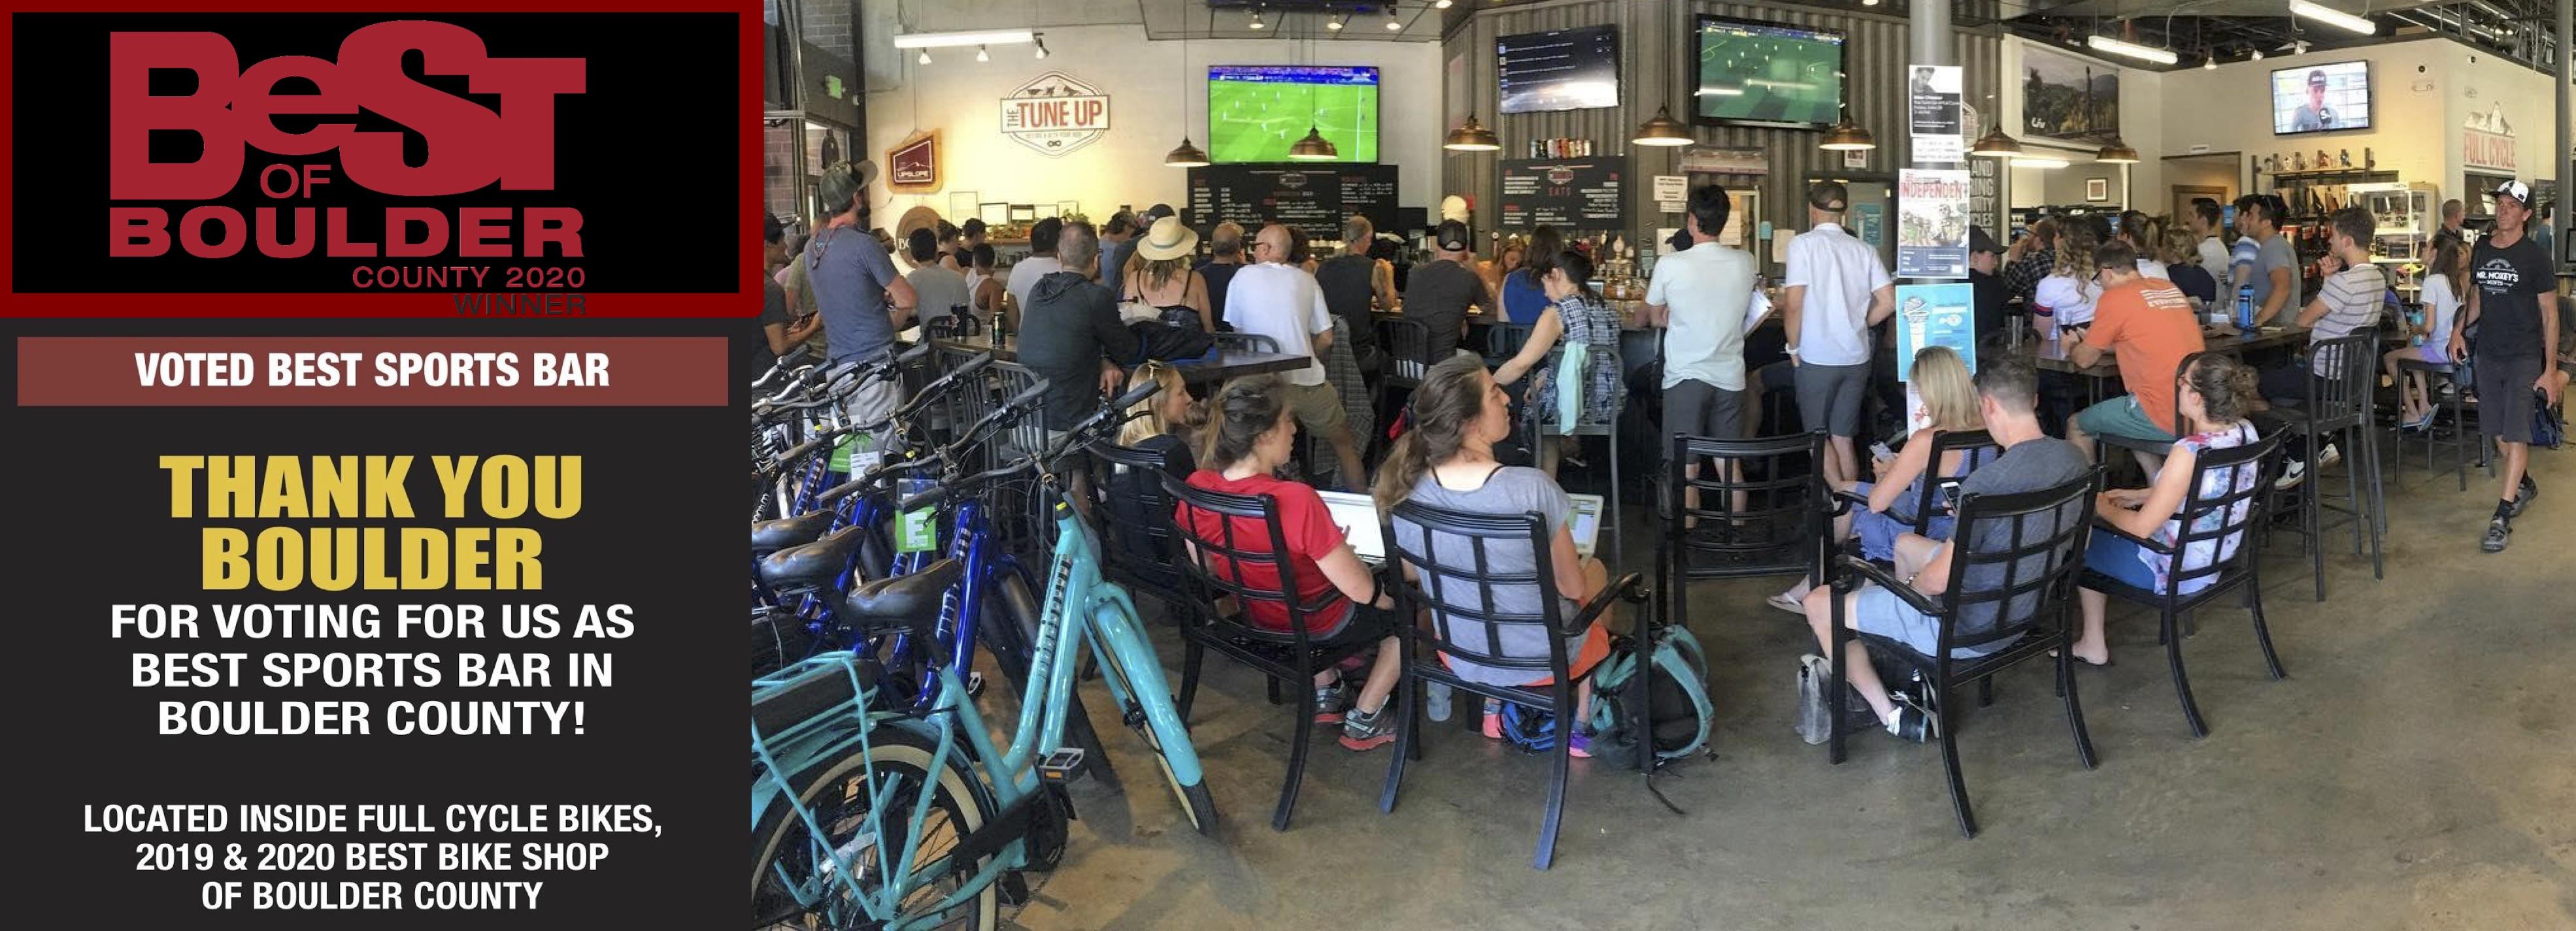 Best of Boulder- Voted best sports bar